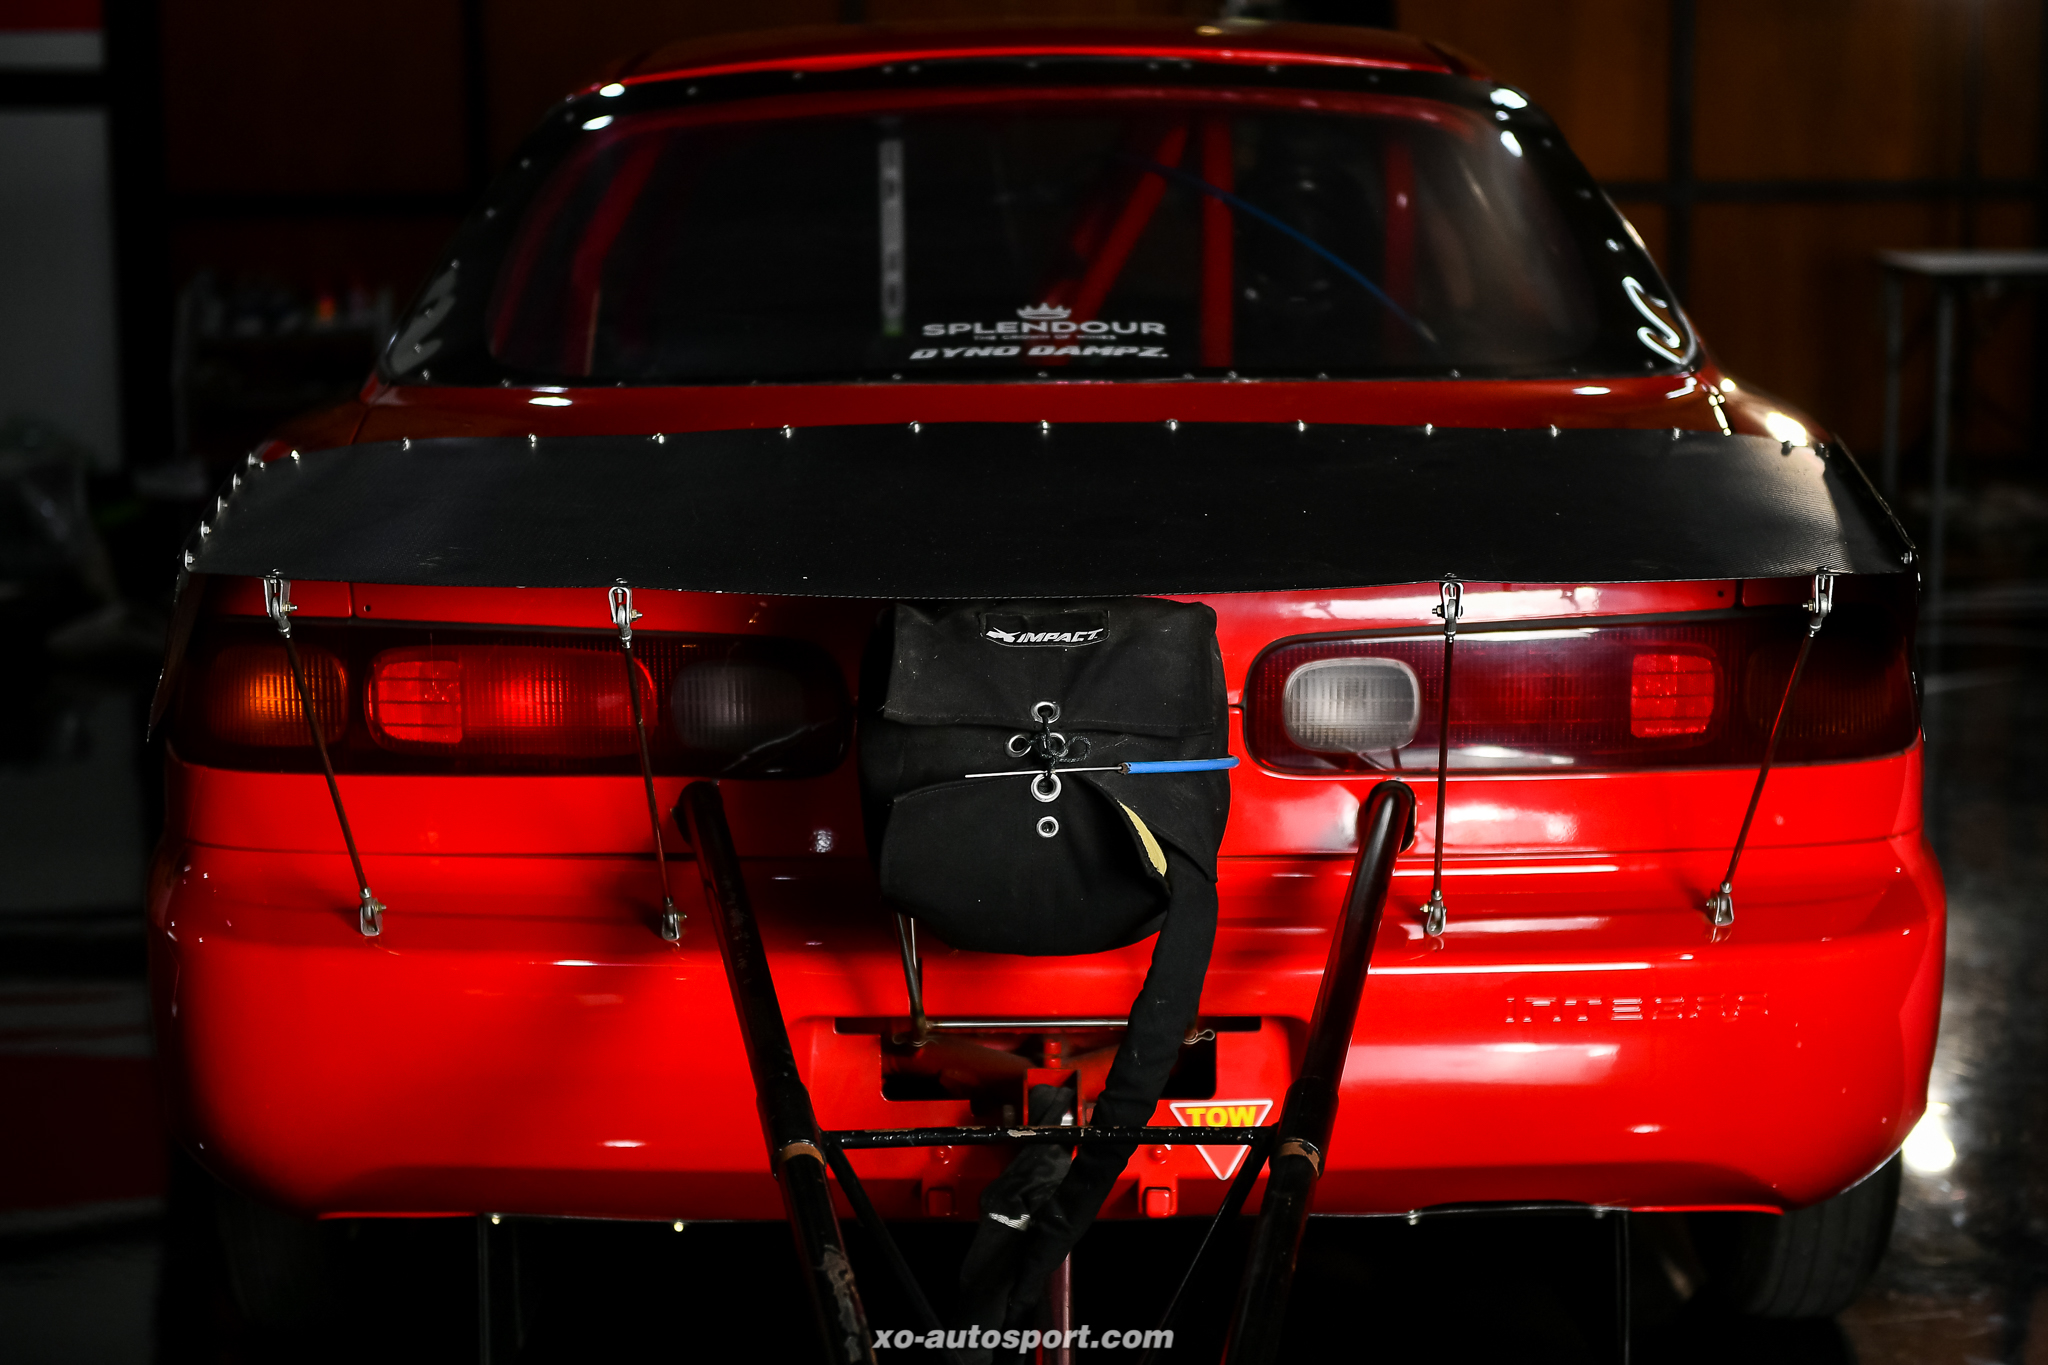 INTEGRA DC2 PRO 4 FWD Champion by FLOW LAB CNC 06